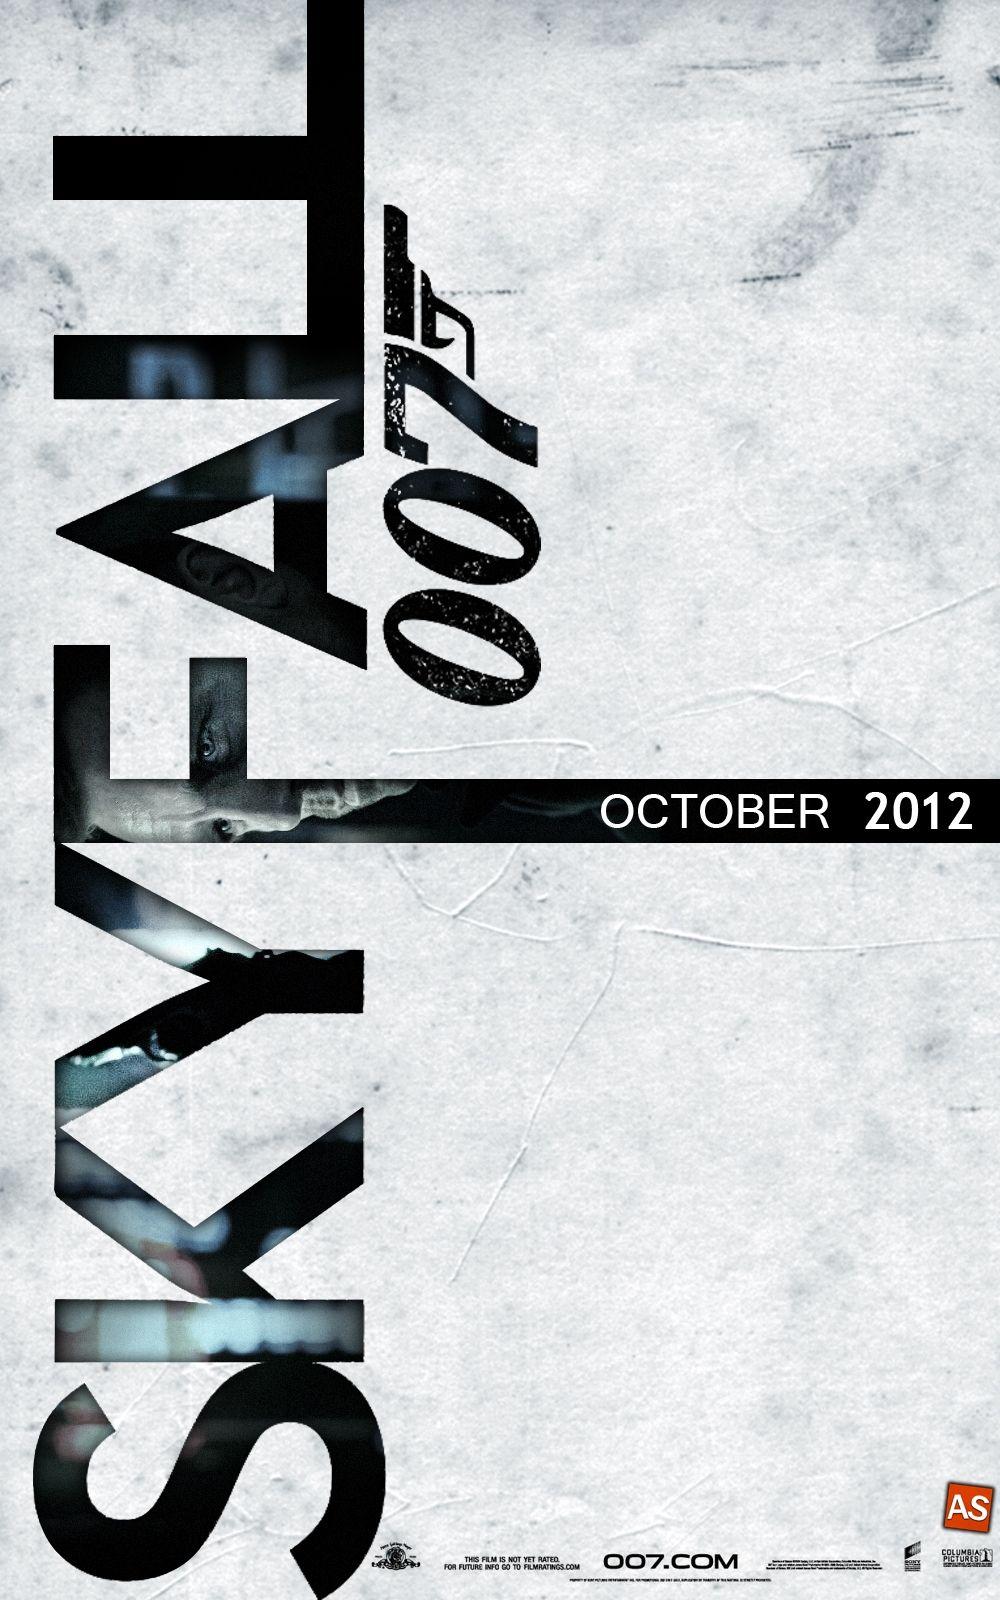 James Bond iPhone Wallpaper ID Skyfall, Cinema posters